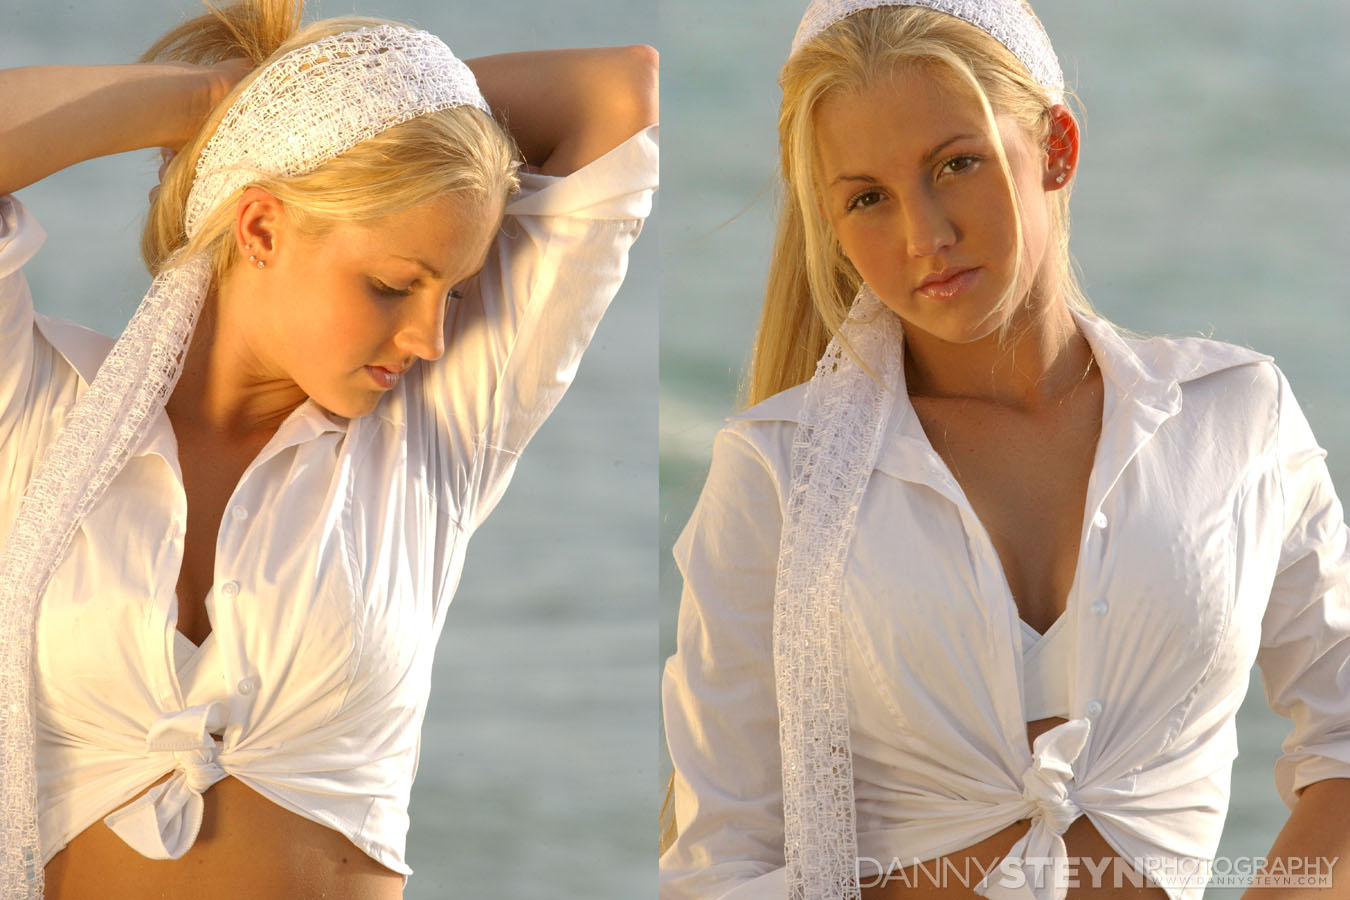 dannys angels south florida models.